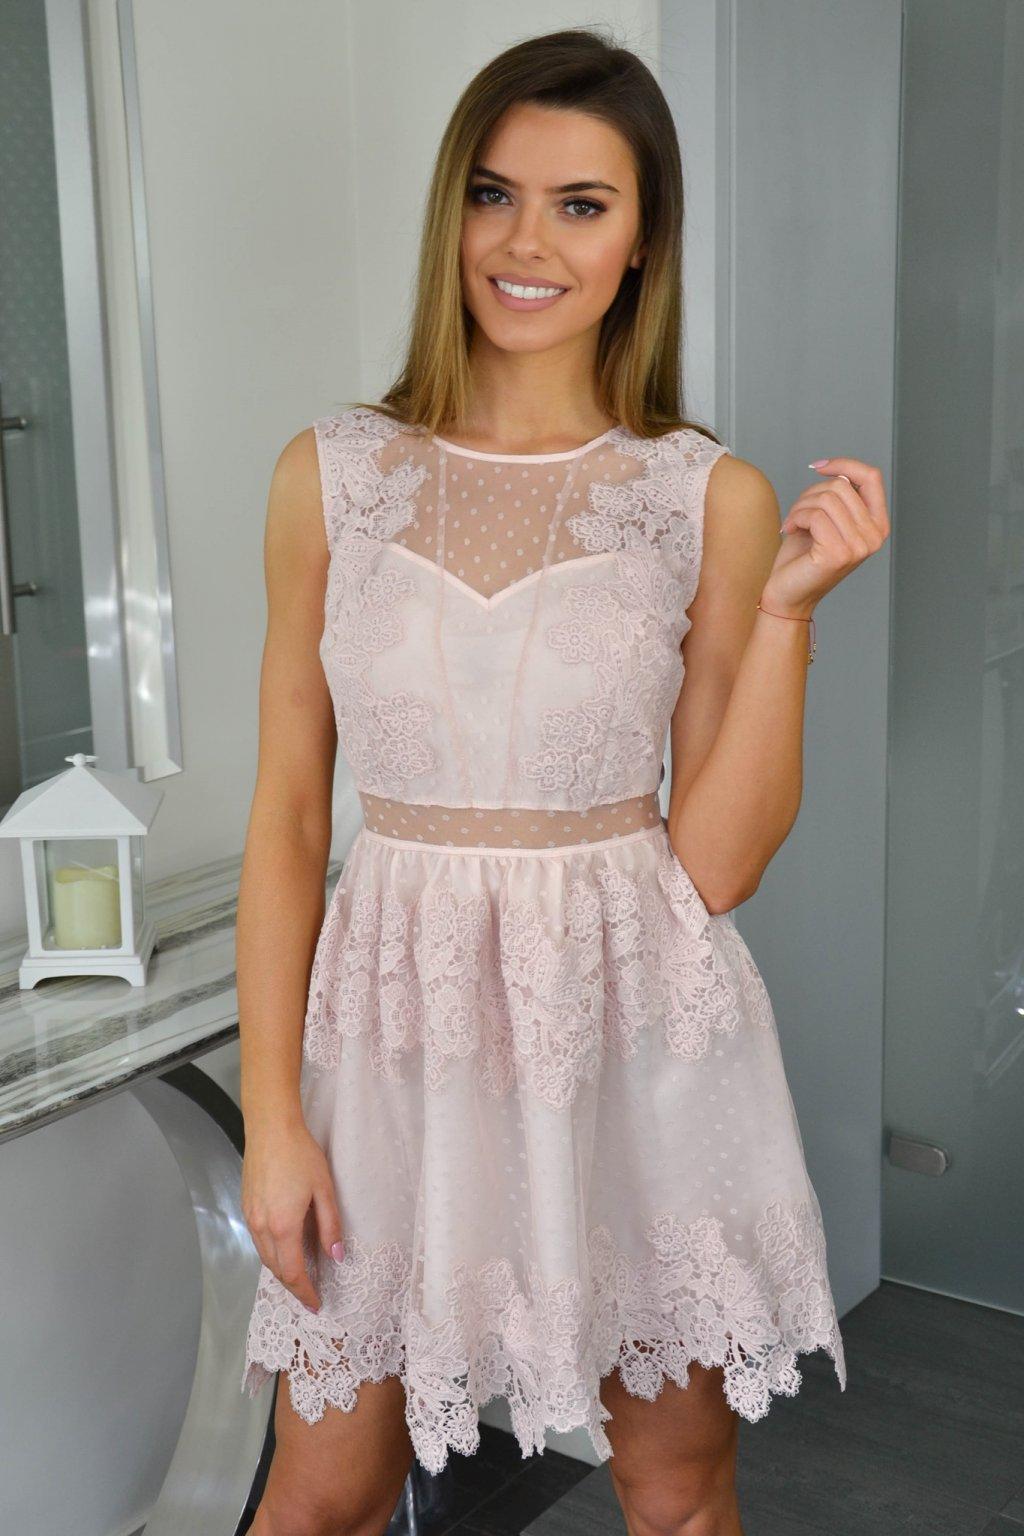 Dámske čipkované šaty 7456 ružové